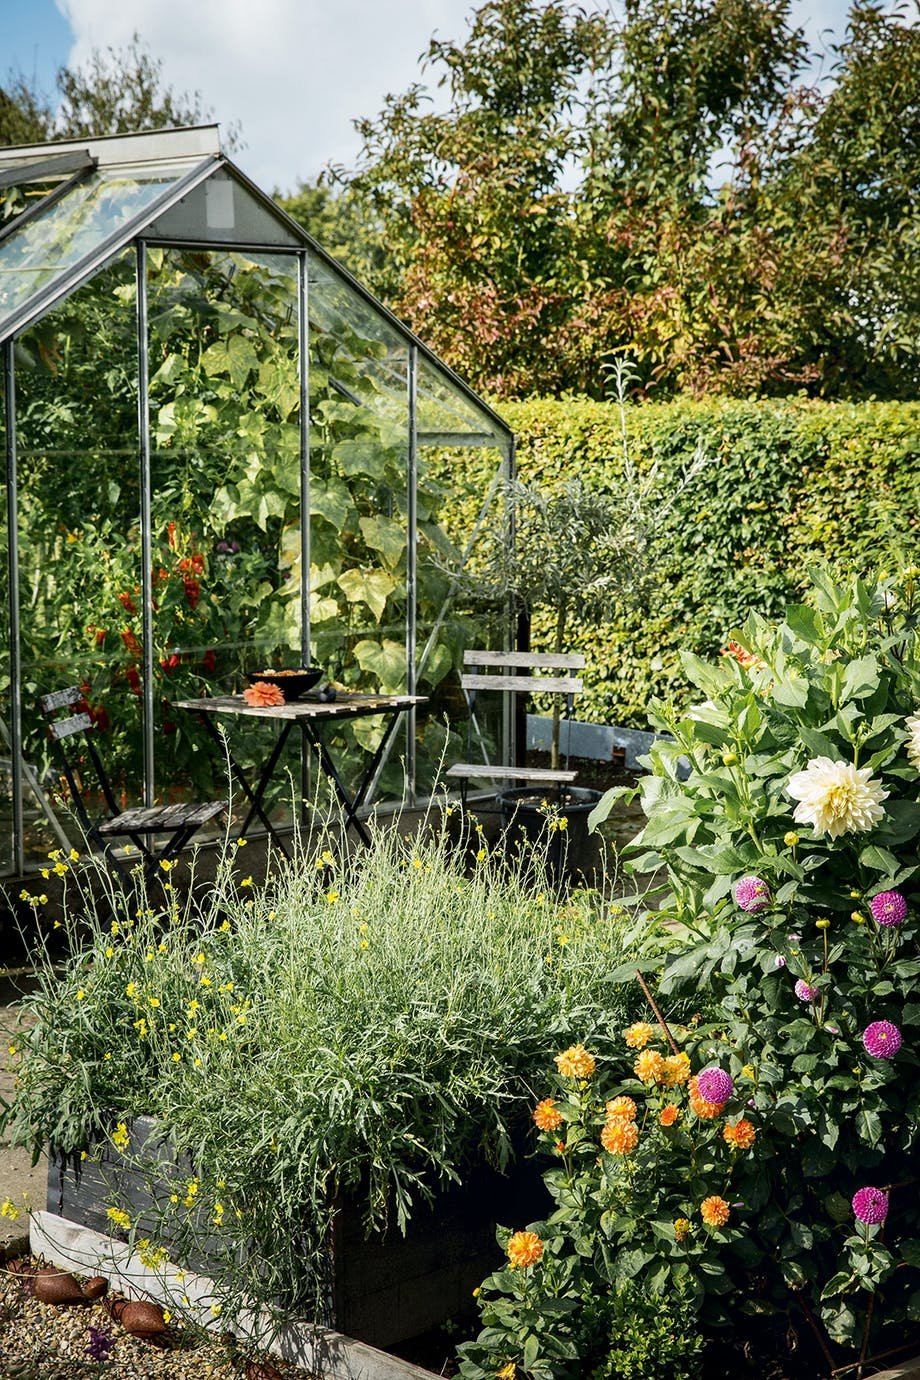 drivhus blomsterbed dahliaer grøntsager